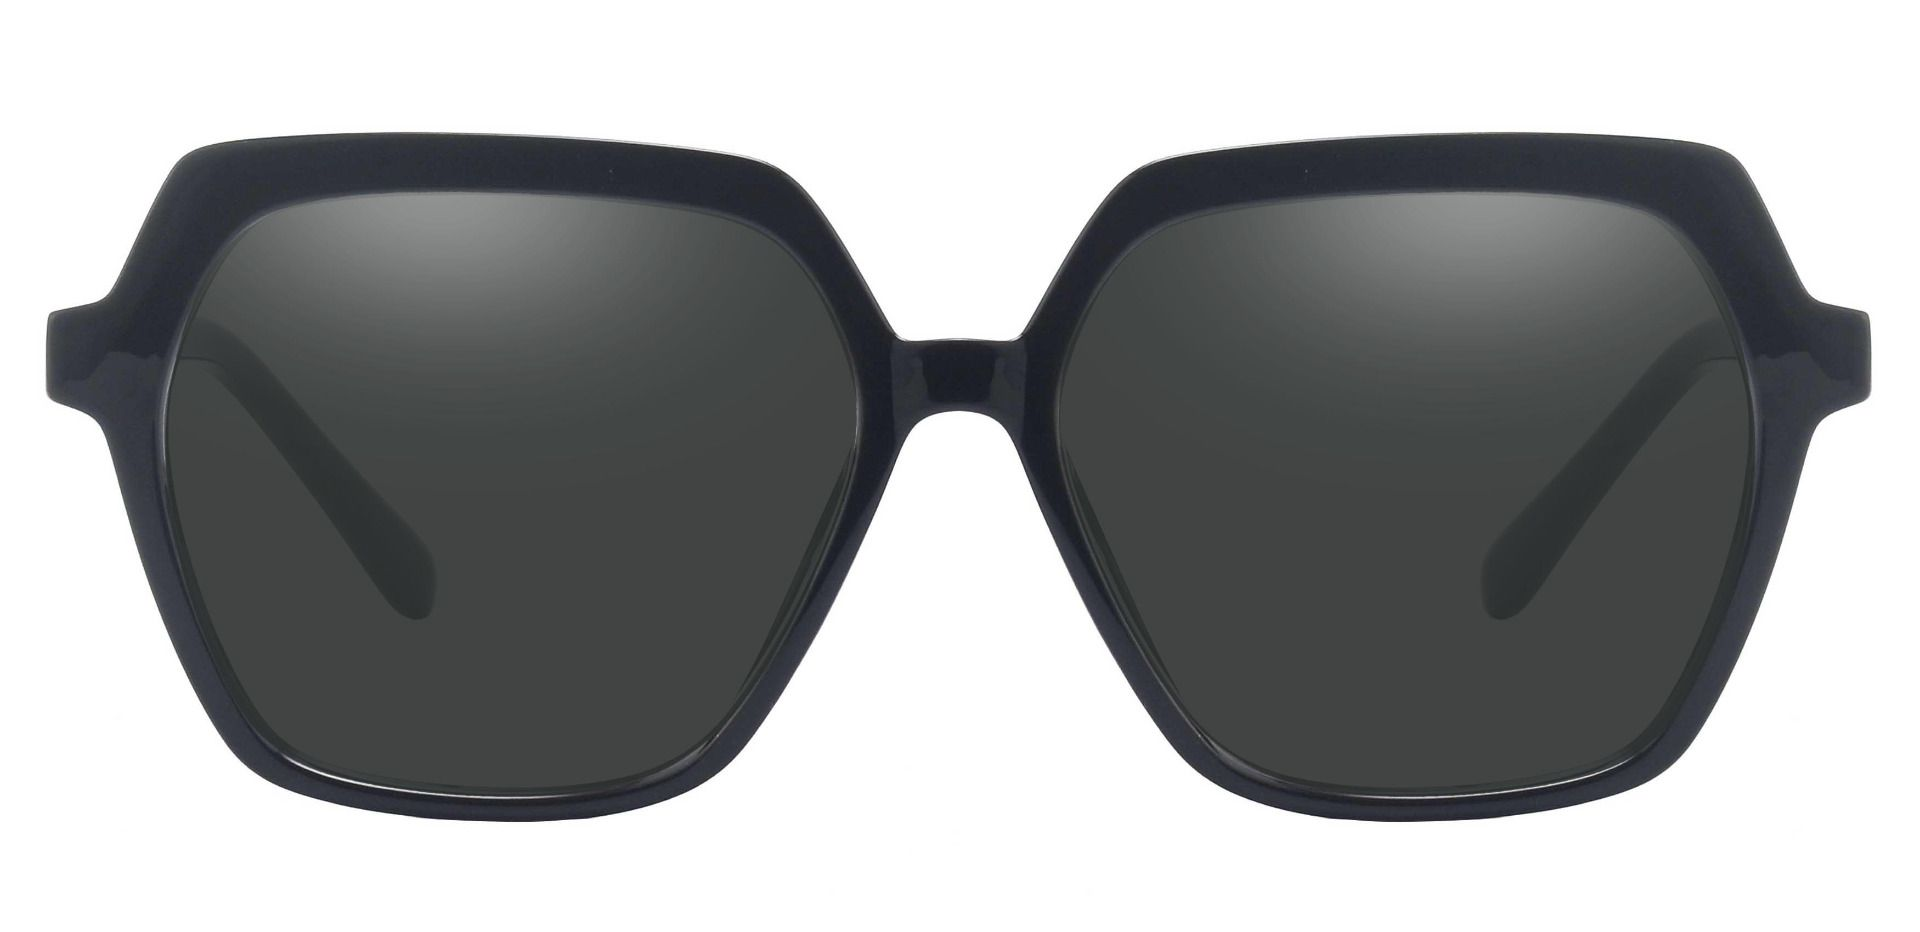 Regent Geometric Lined Bifocal Sunglasses - Black Frame With Gray Lenses